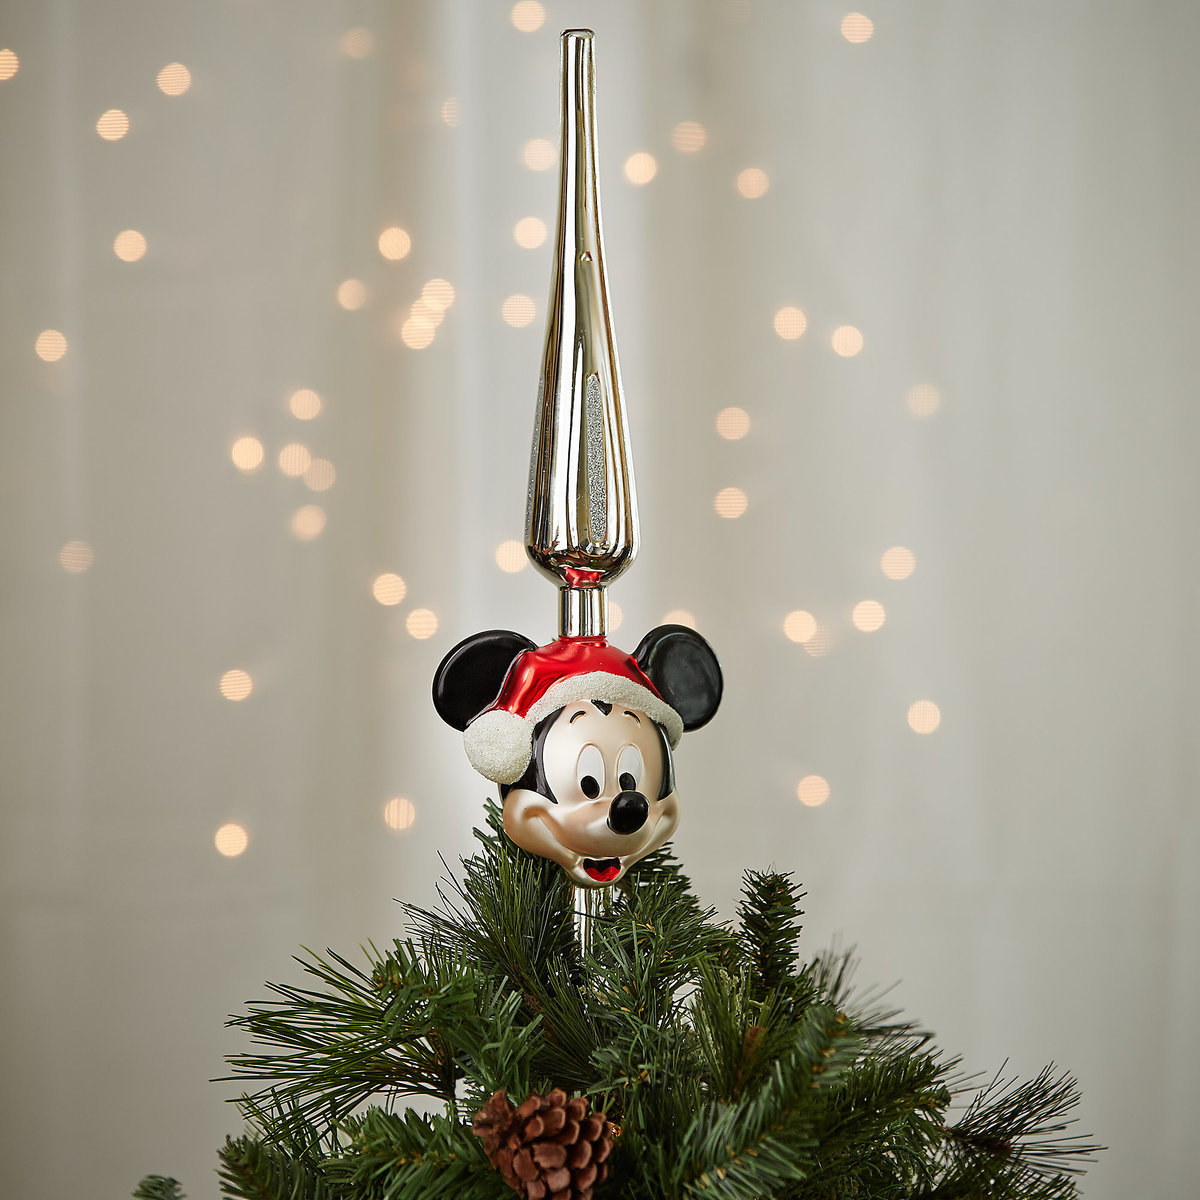 santa mickey mouse glass tree topper - Glass Christmas Tree Topper